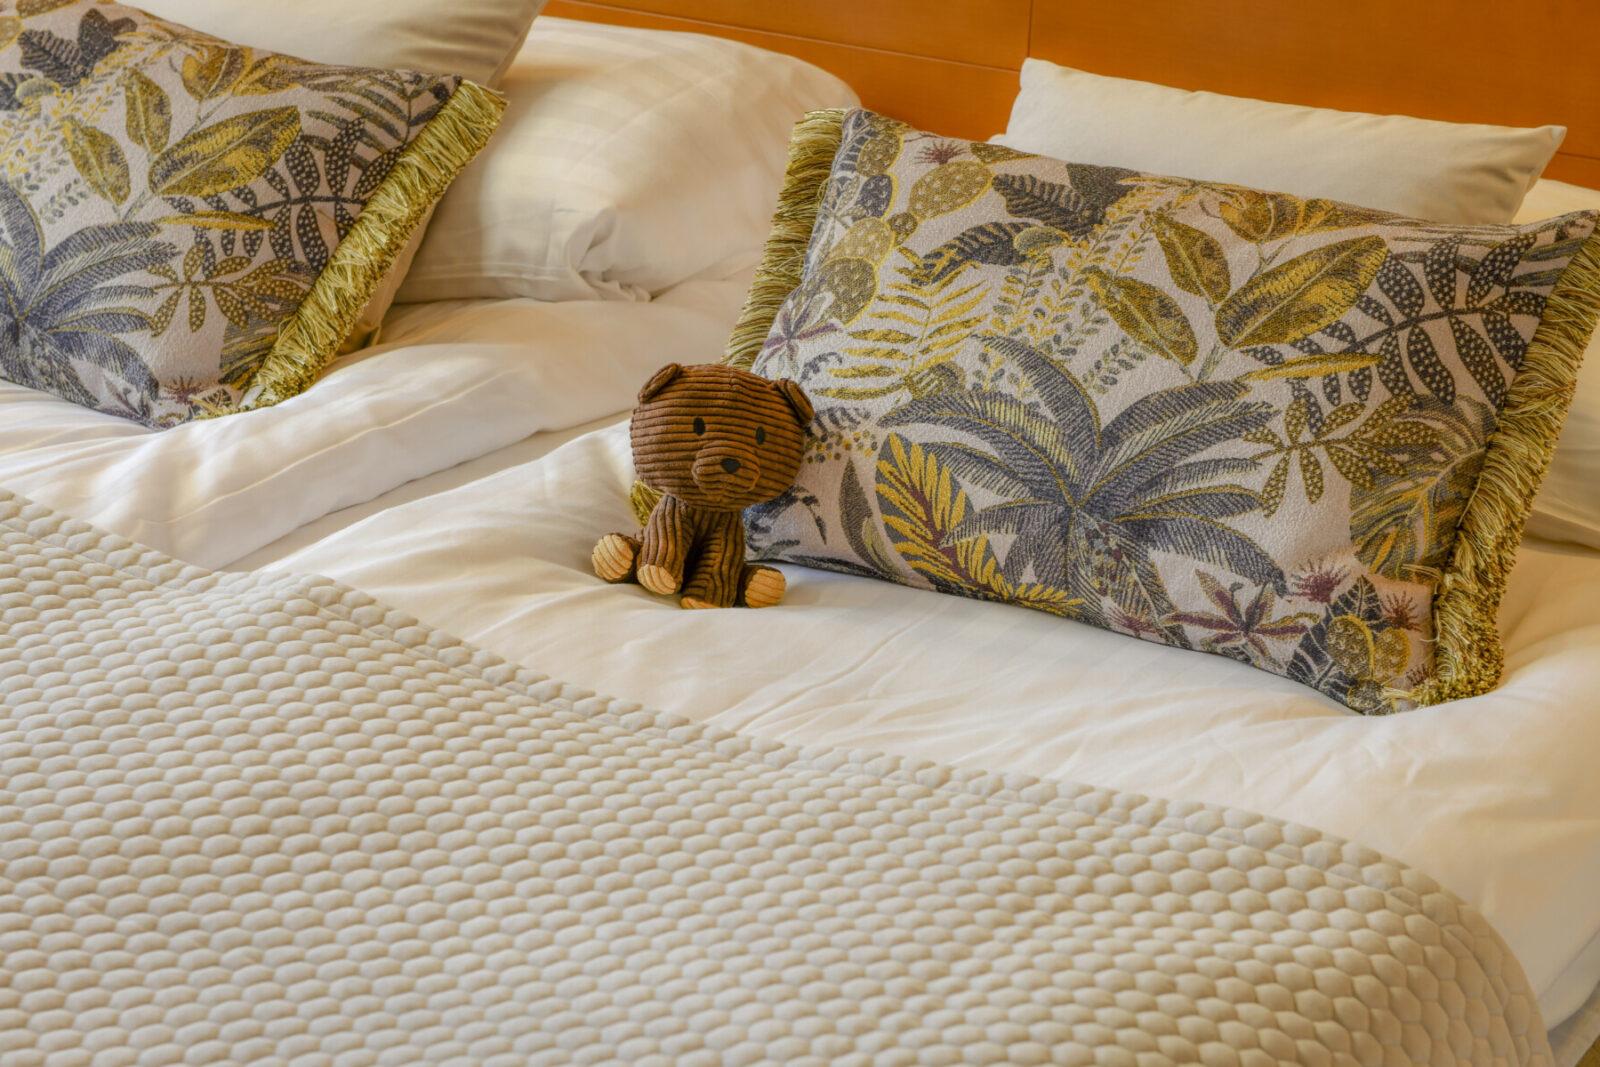 Hotelli Vuokatti cozy double